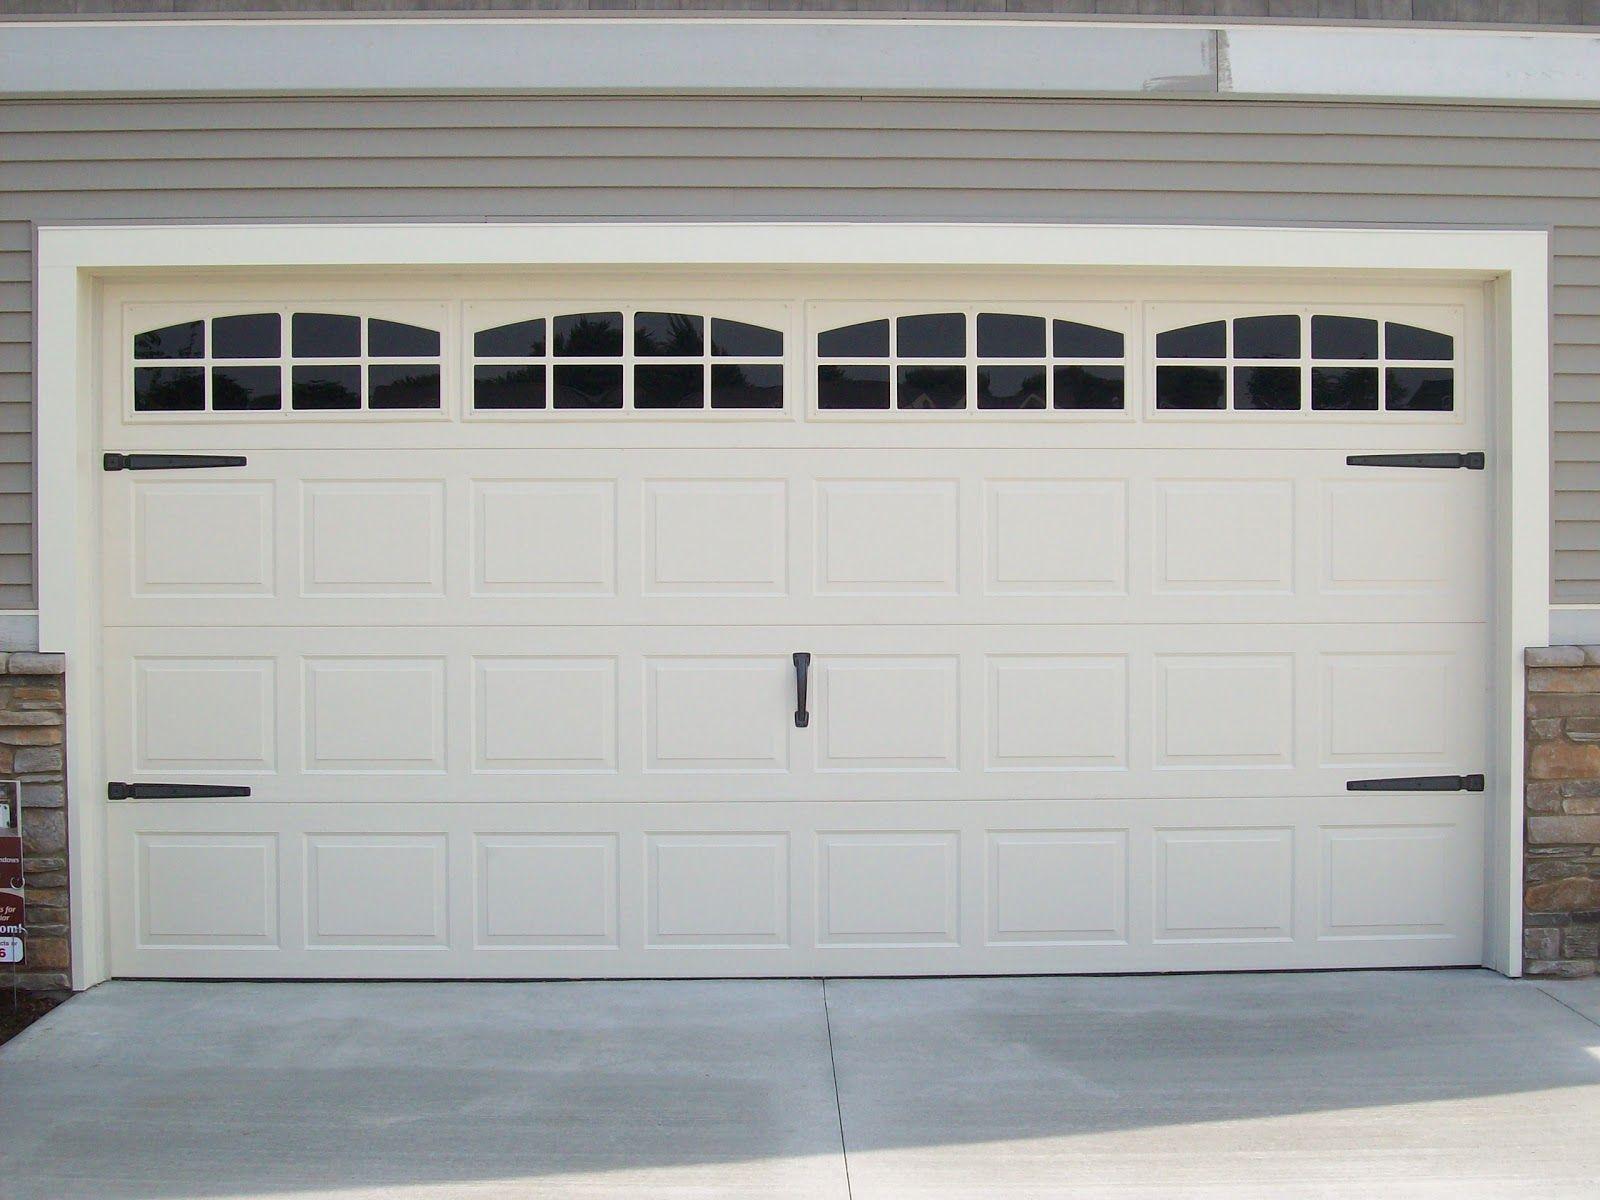 Double Garage Doors With Windows 1000+ ötlet a következőről: garage door window inserts a pinteresten